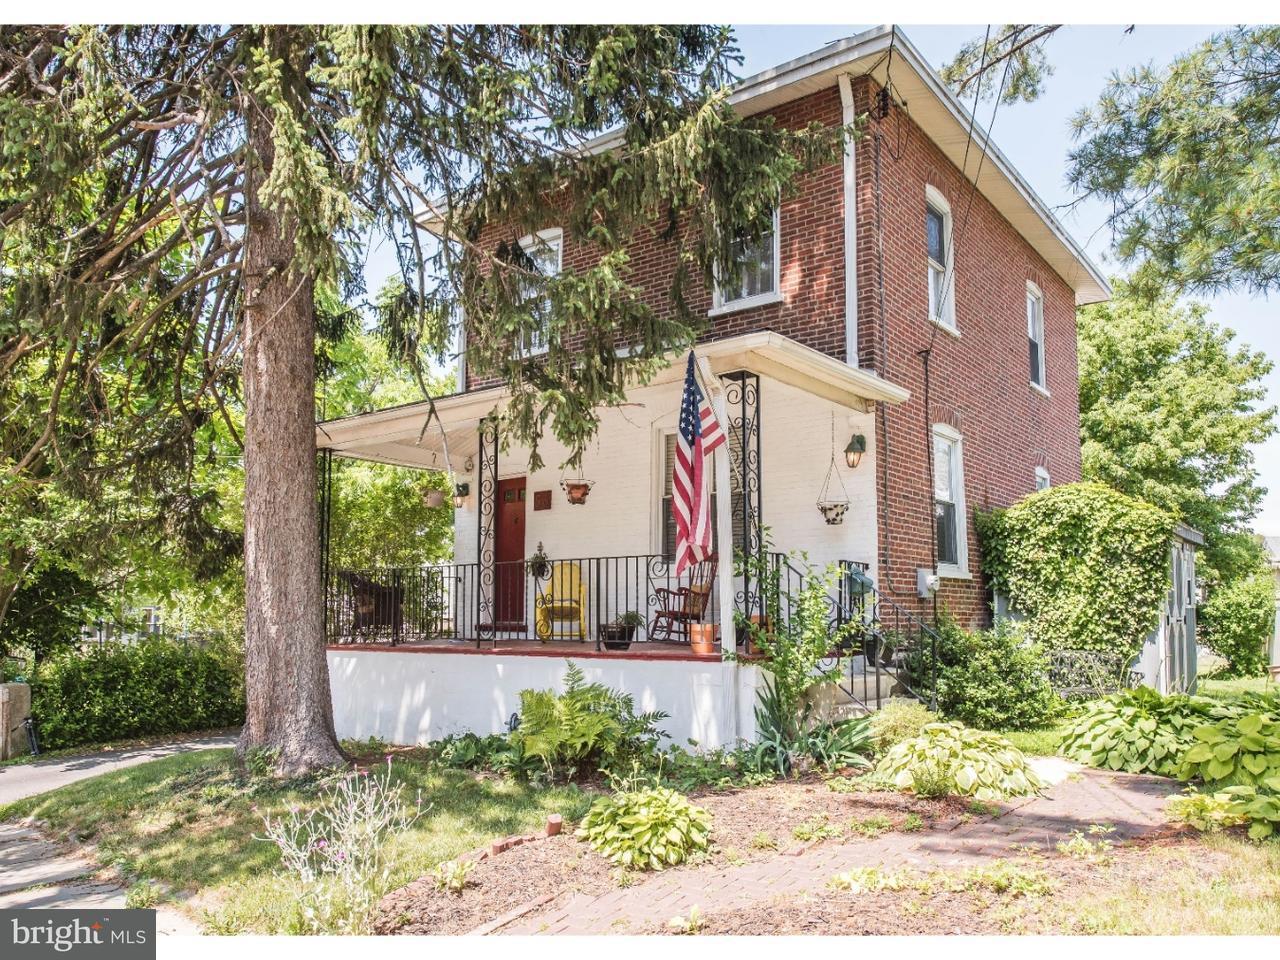 Single Family Home for Sale at 53 E CLEVELAND Avenue Norwood, Pennsylvania 19074 United States